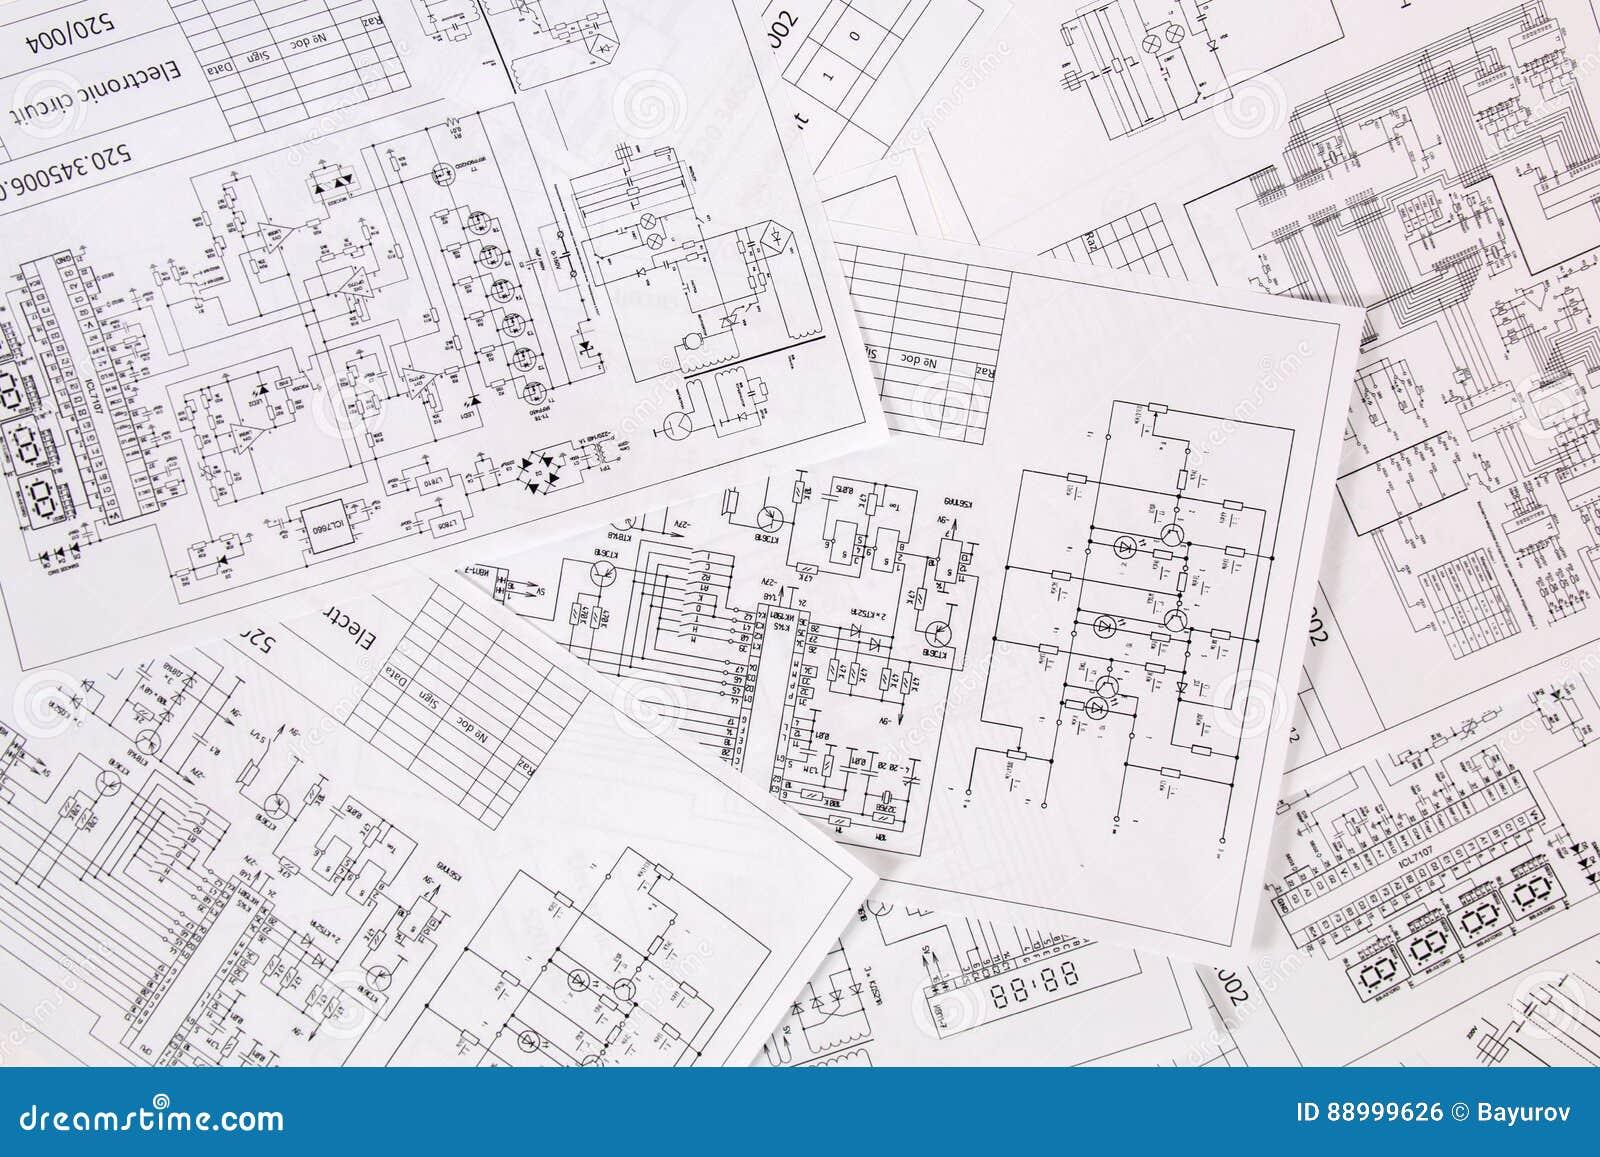 Printed Electrical Drawings Stock Photo - Image of measure, engineer ...